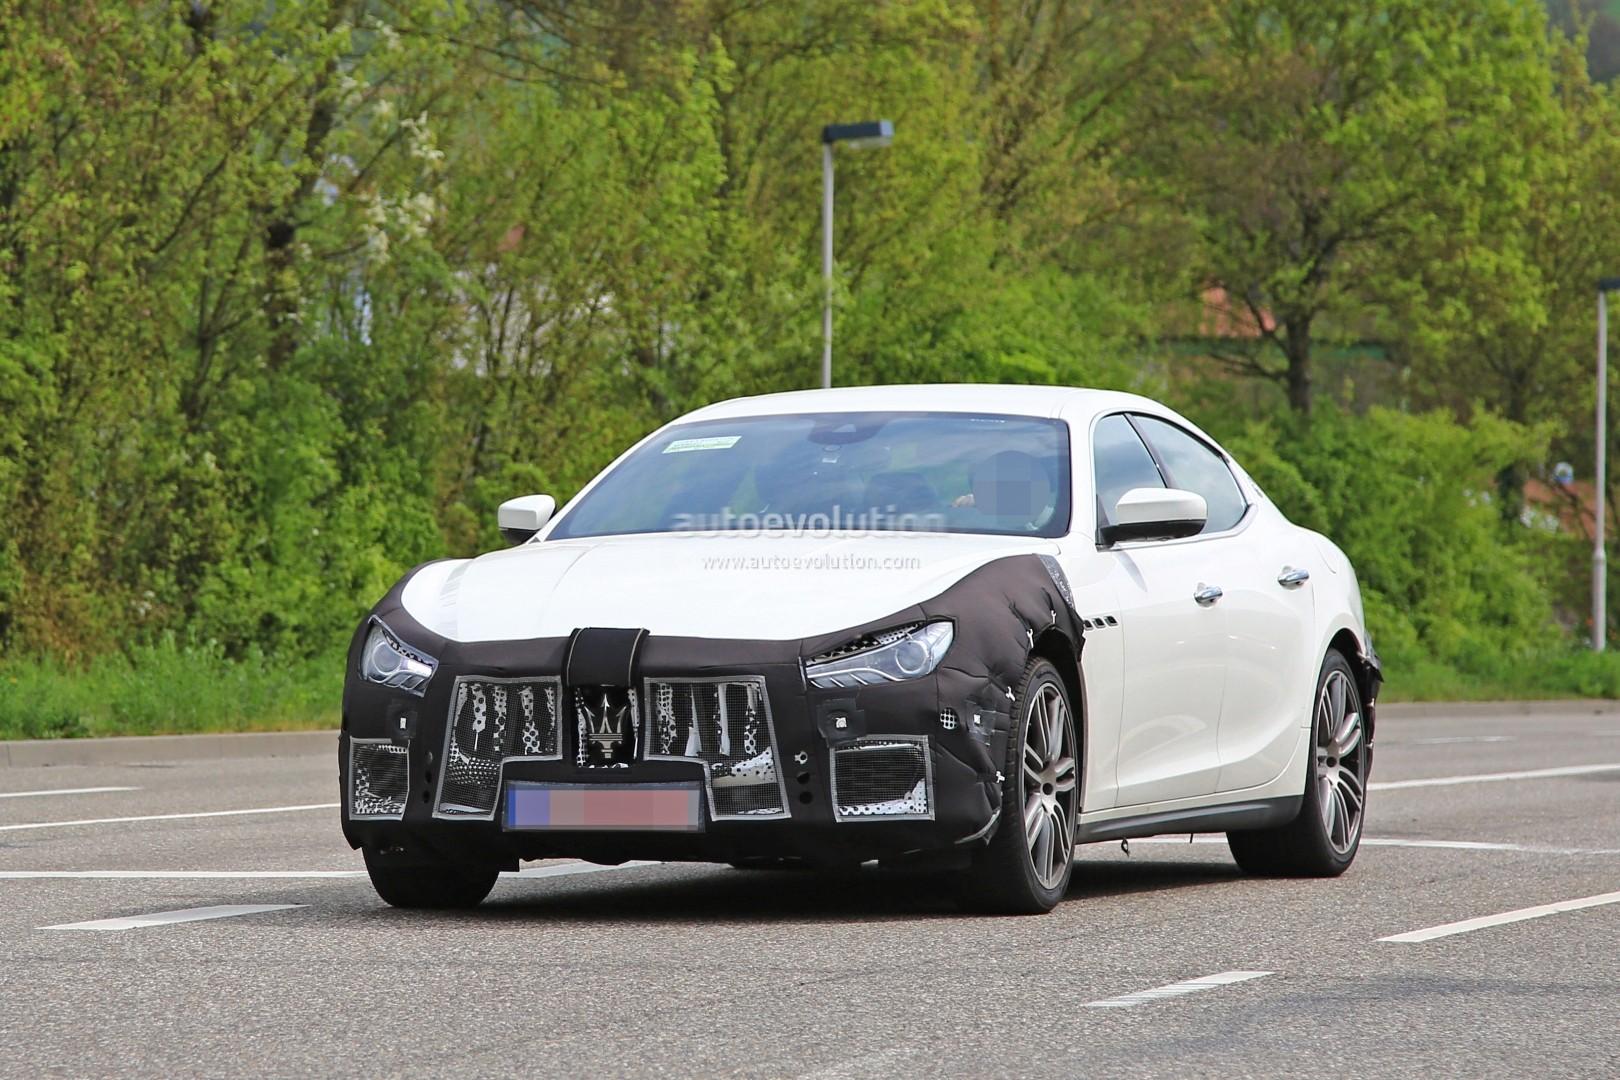 2018 maserati 4 door. Beautiful 2018 2018 Maserati Ghibli Facelift  In Maserati 4 Door